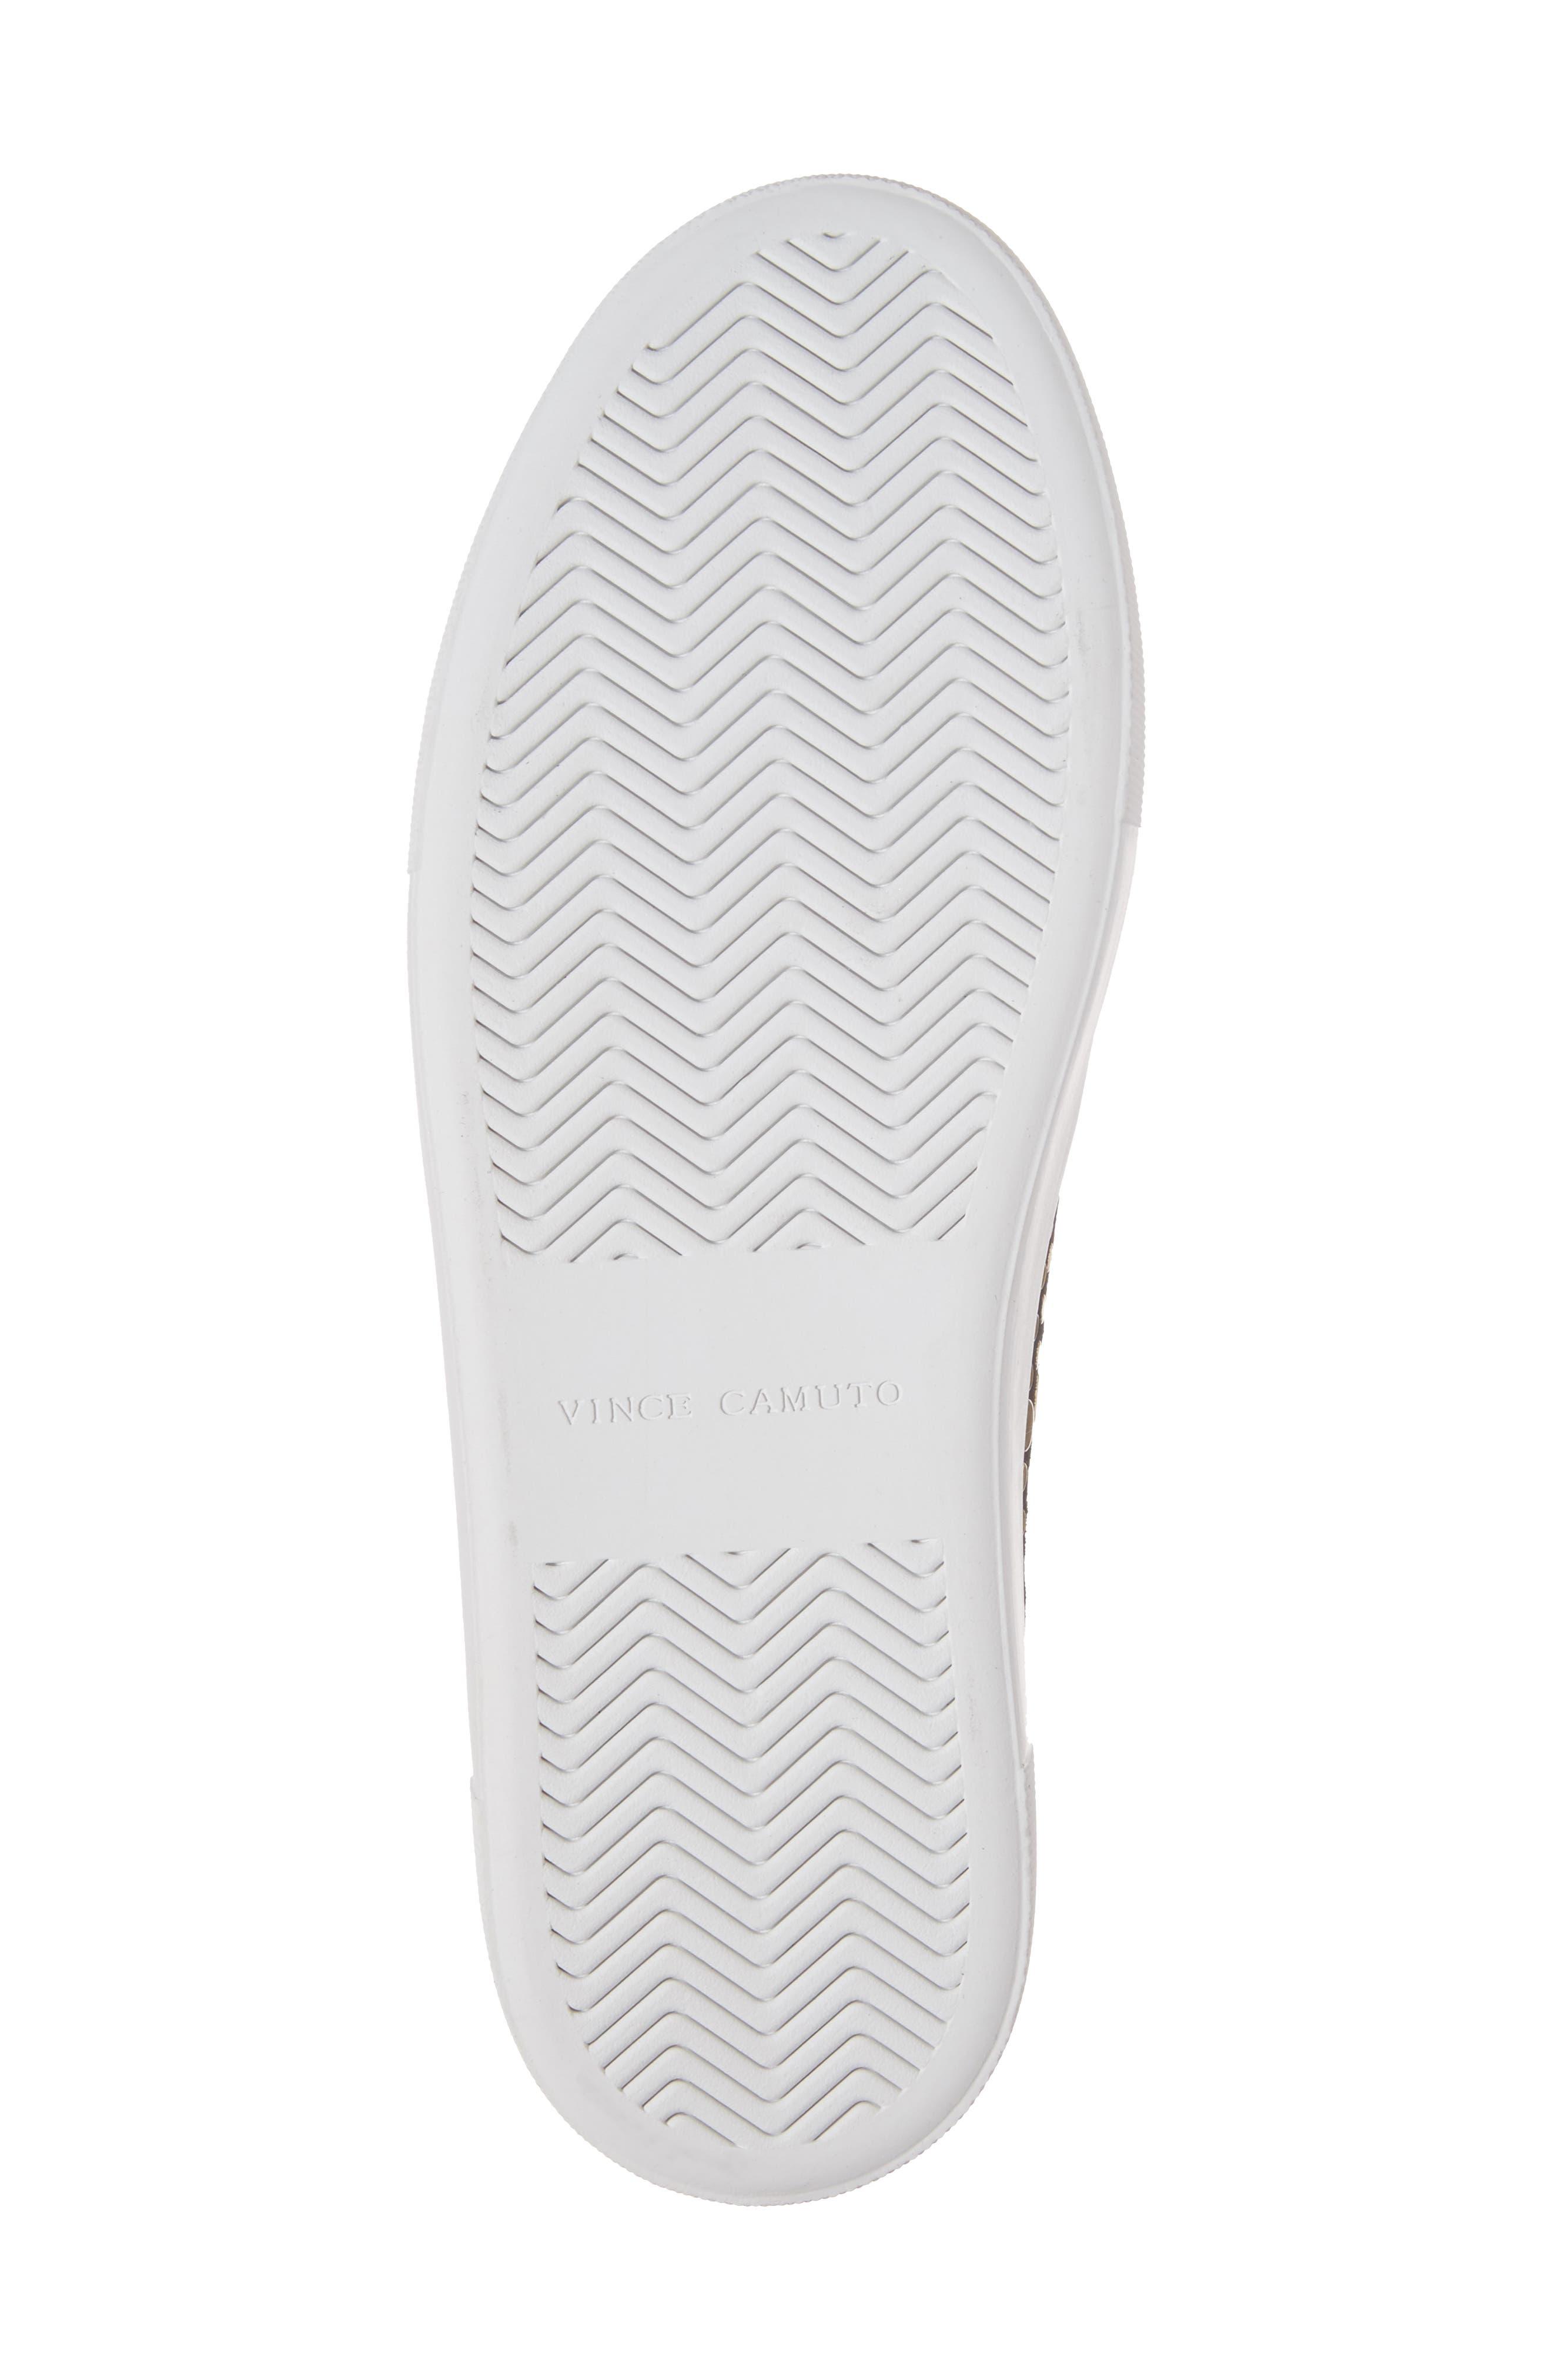 Kindra Stud Slip-On Sneaker,                             Alternate thumbnail 6, color,                             Black Suede